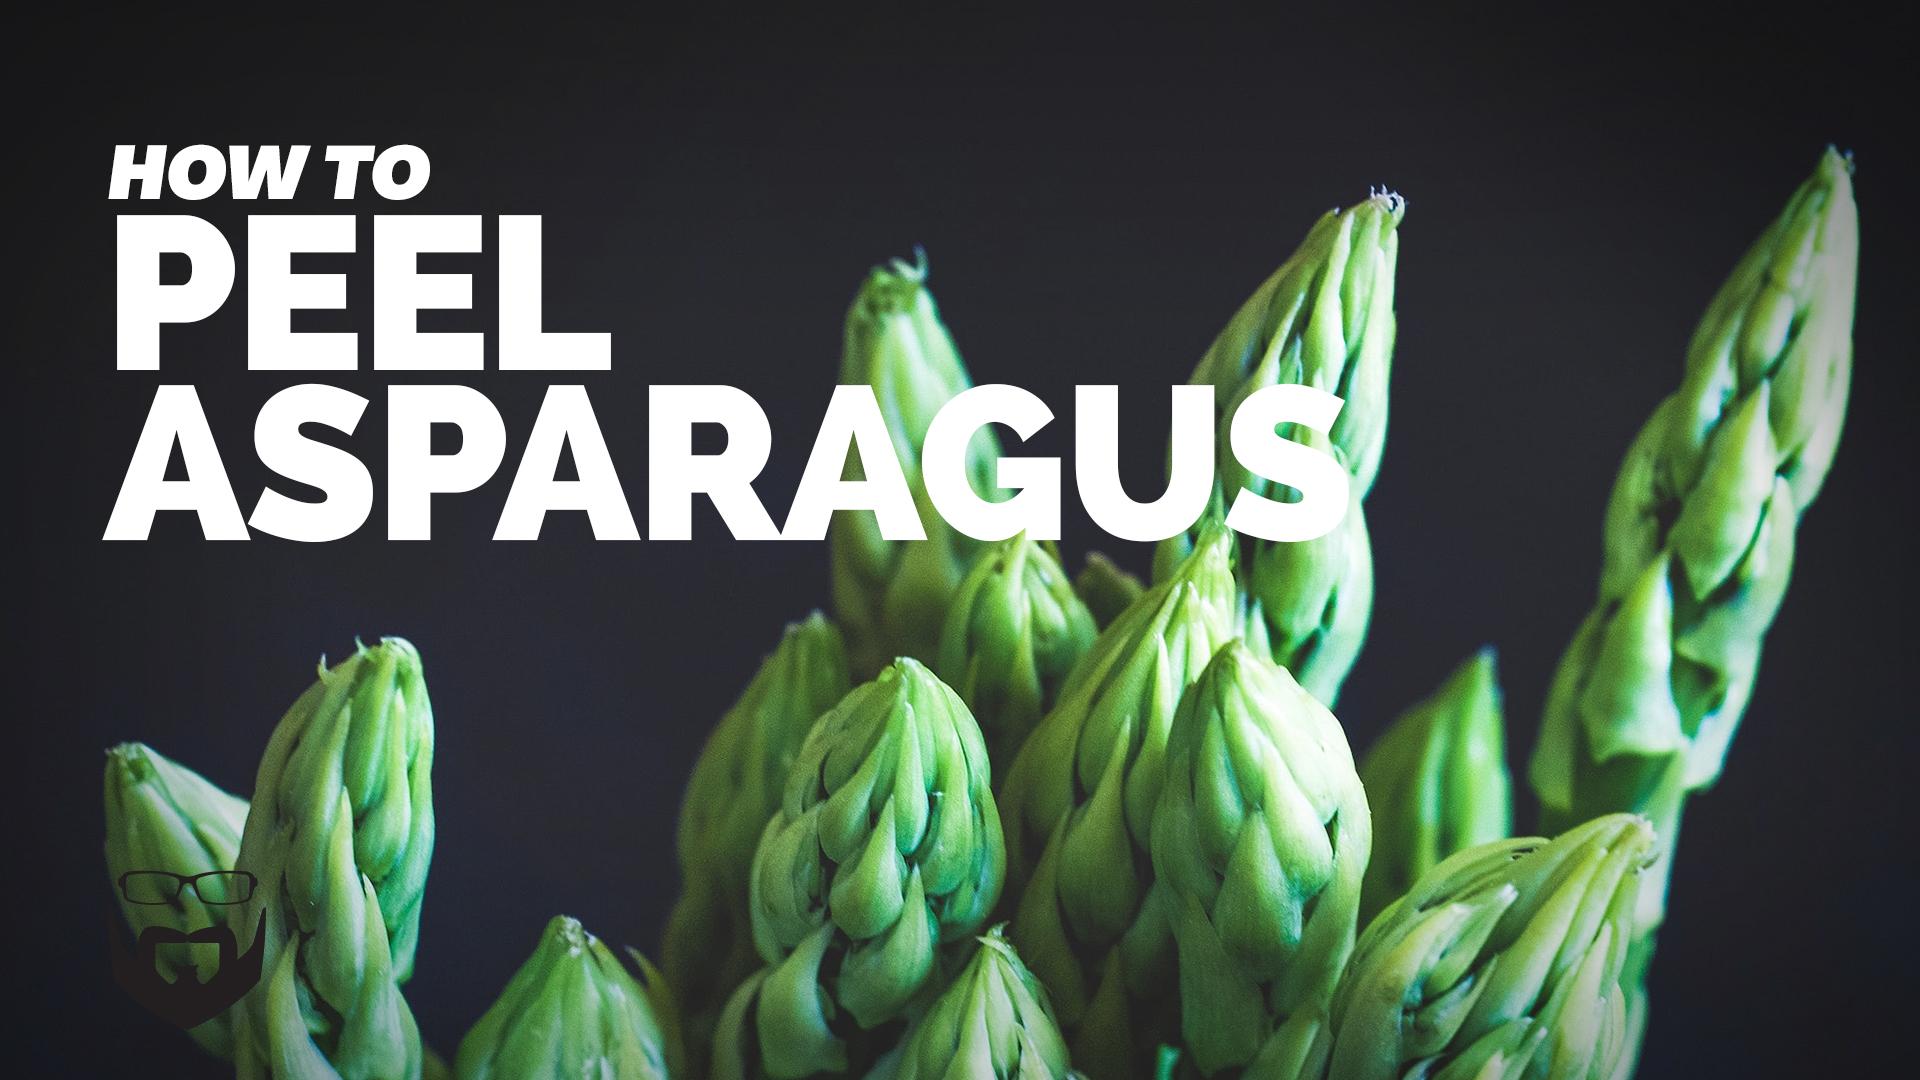 How to Peel Asparagus